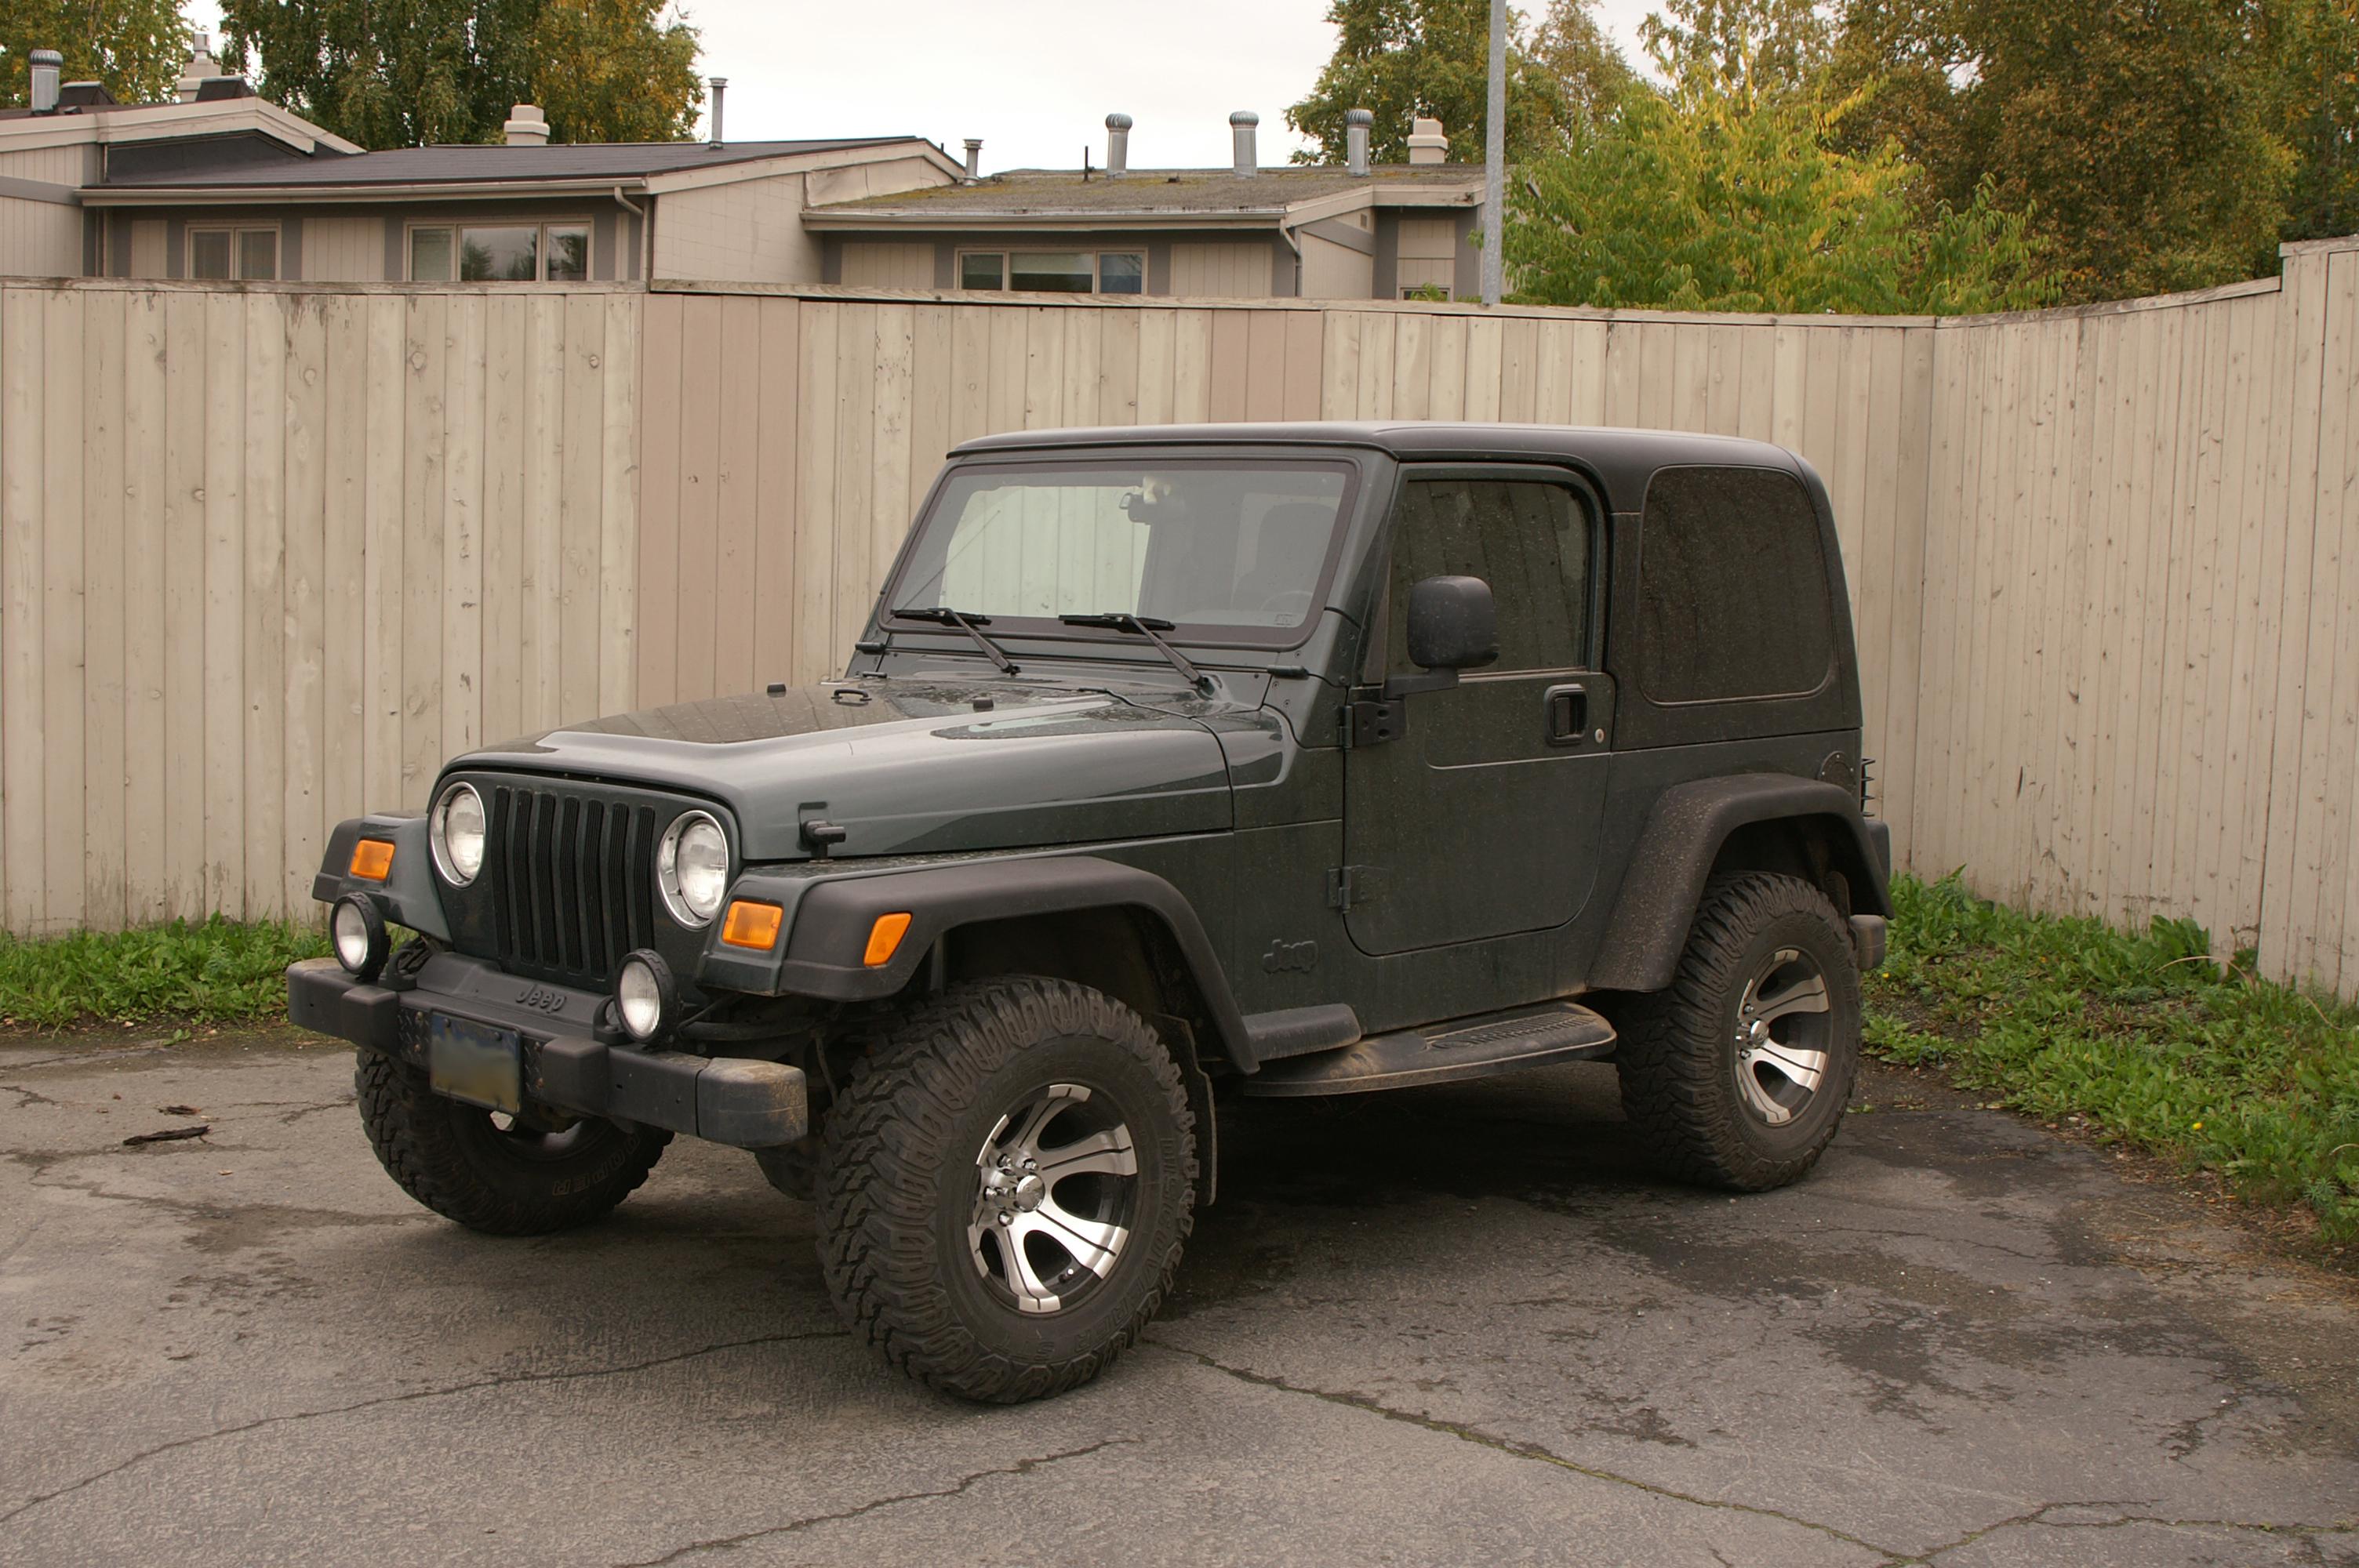 Jeep Wrangler 2008 foto - 1